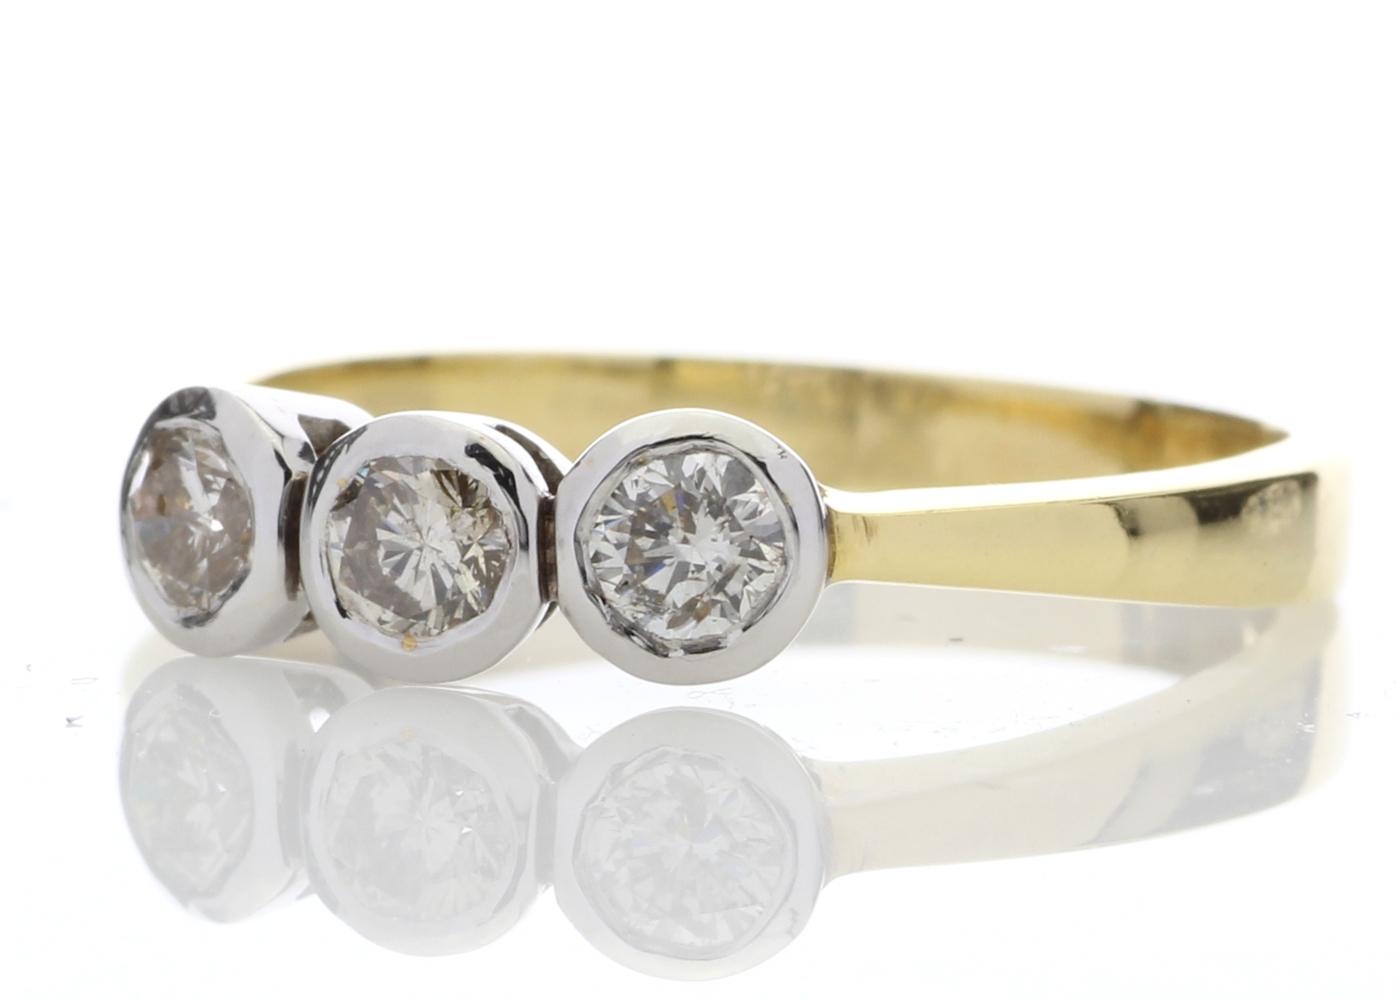 18ct Three Stone Claw Set Diamond Ring 0.75 Carats - Image 2 of 4